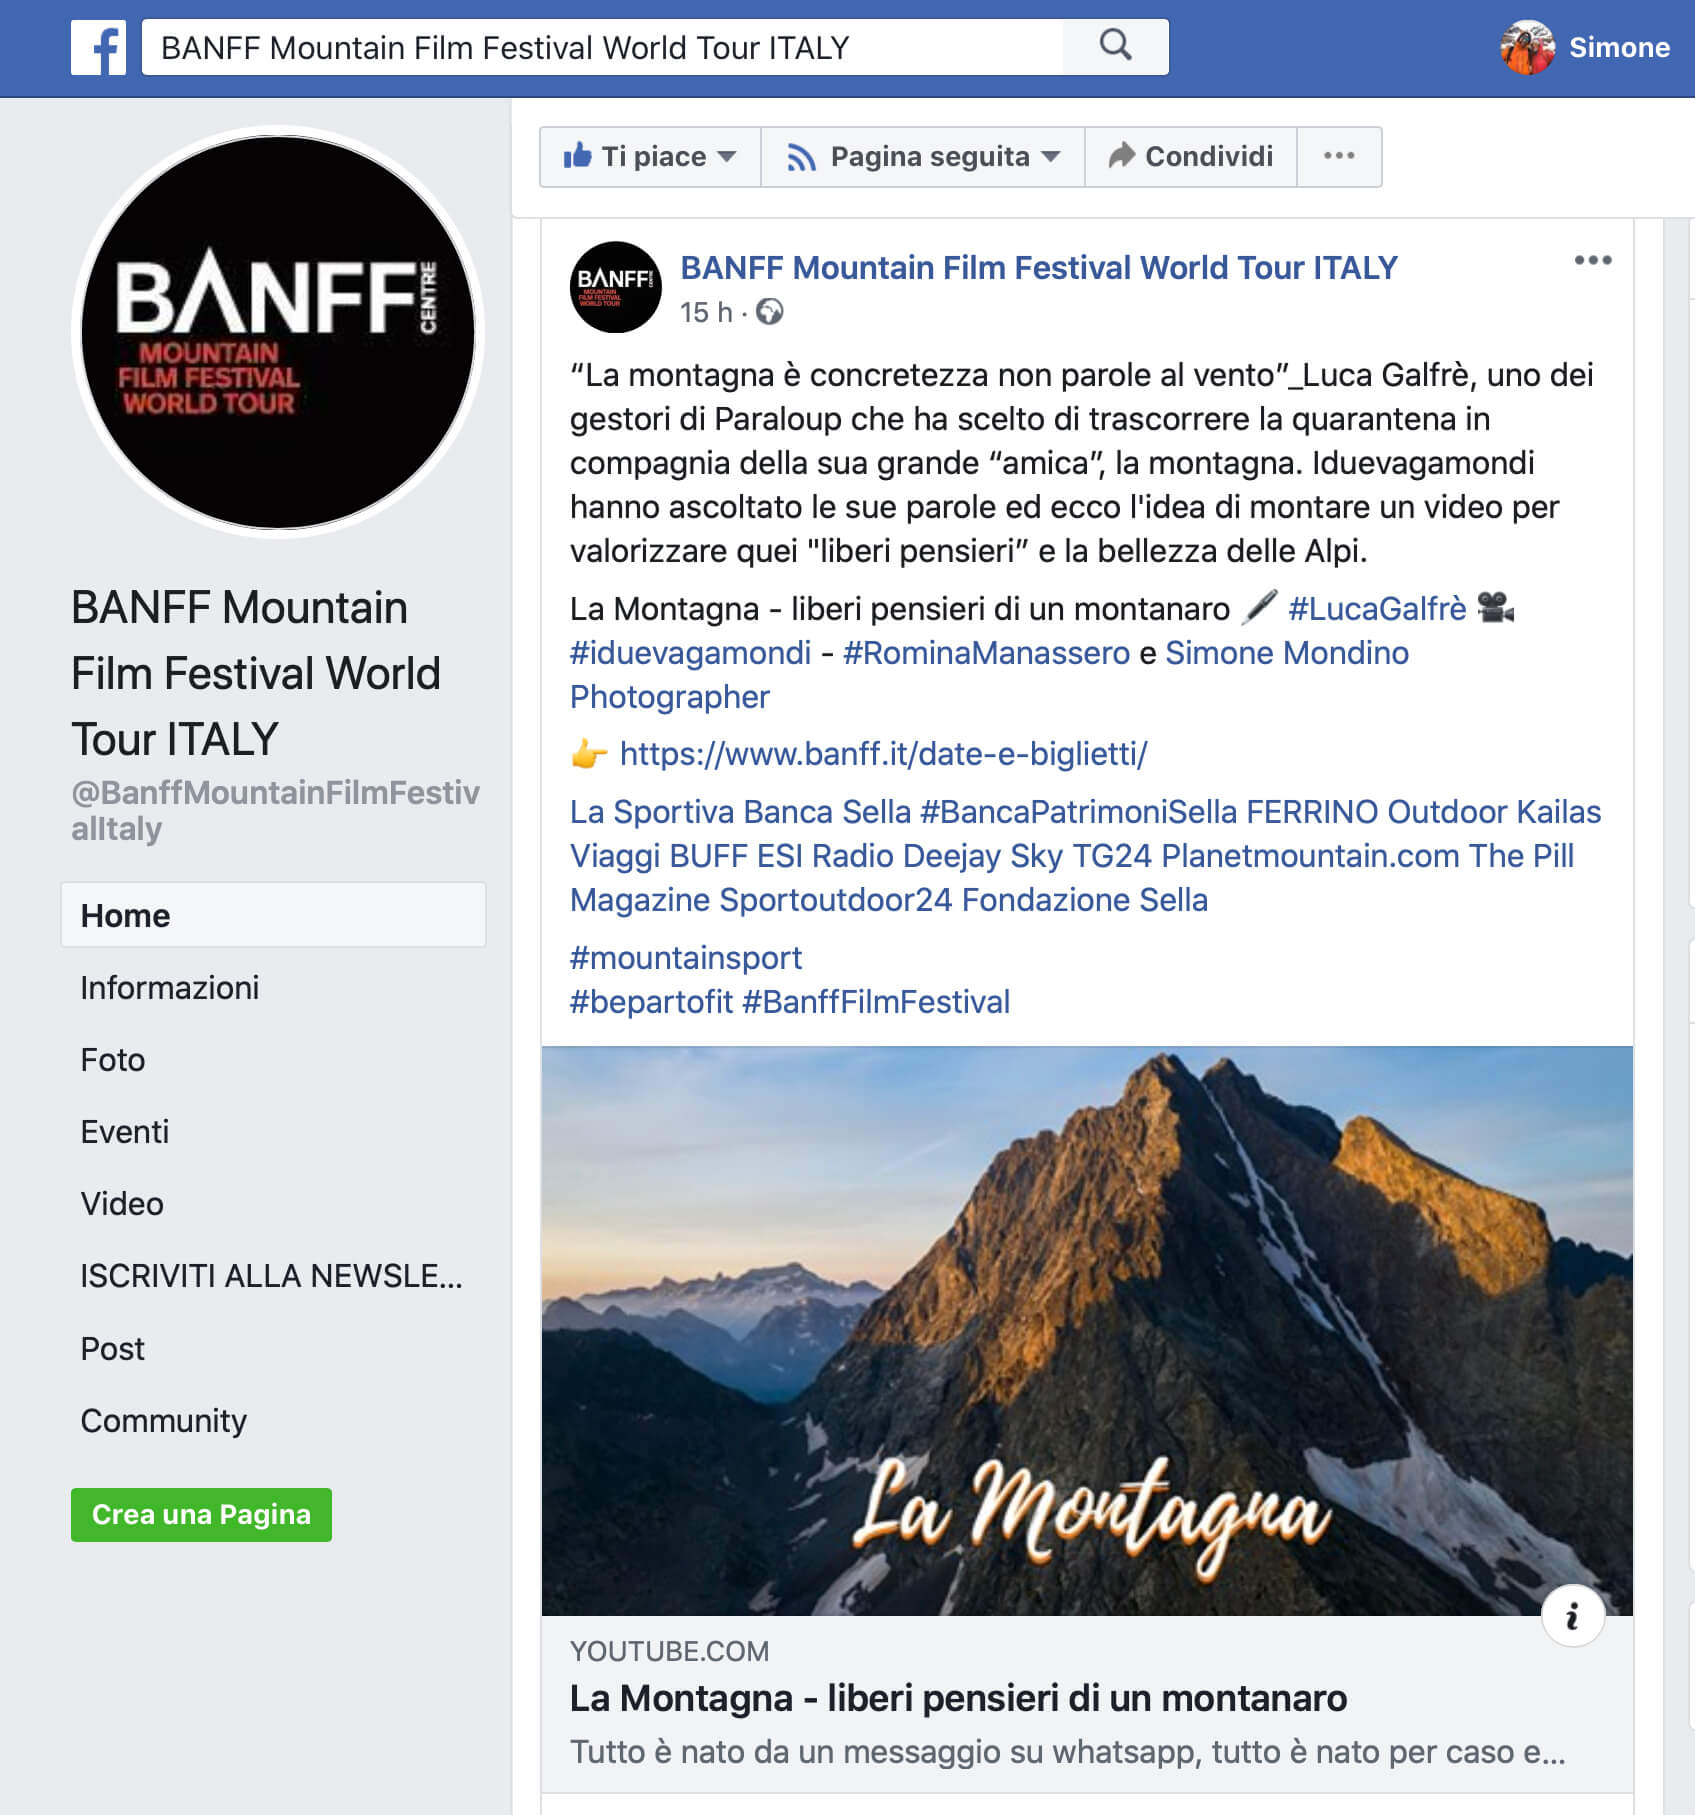 Banff film festival Italia - La Montagna